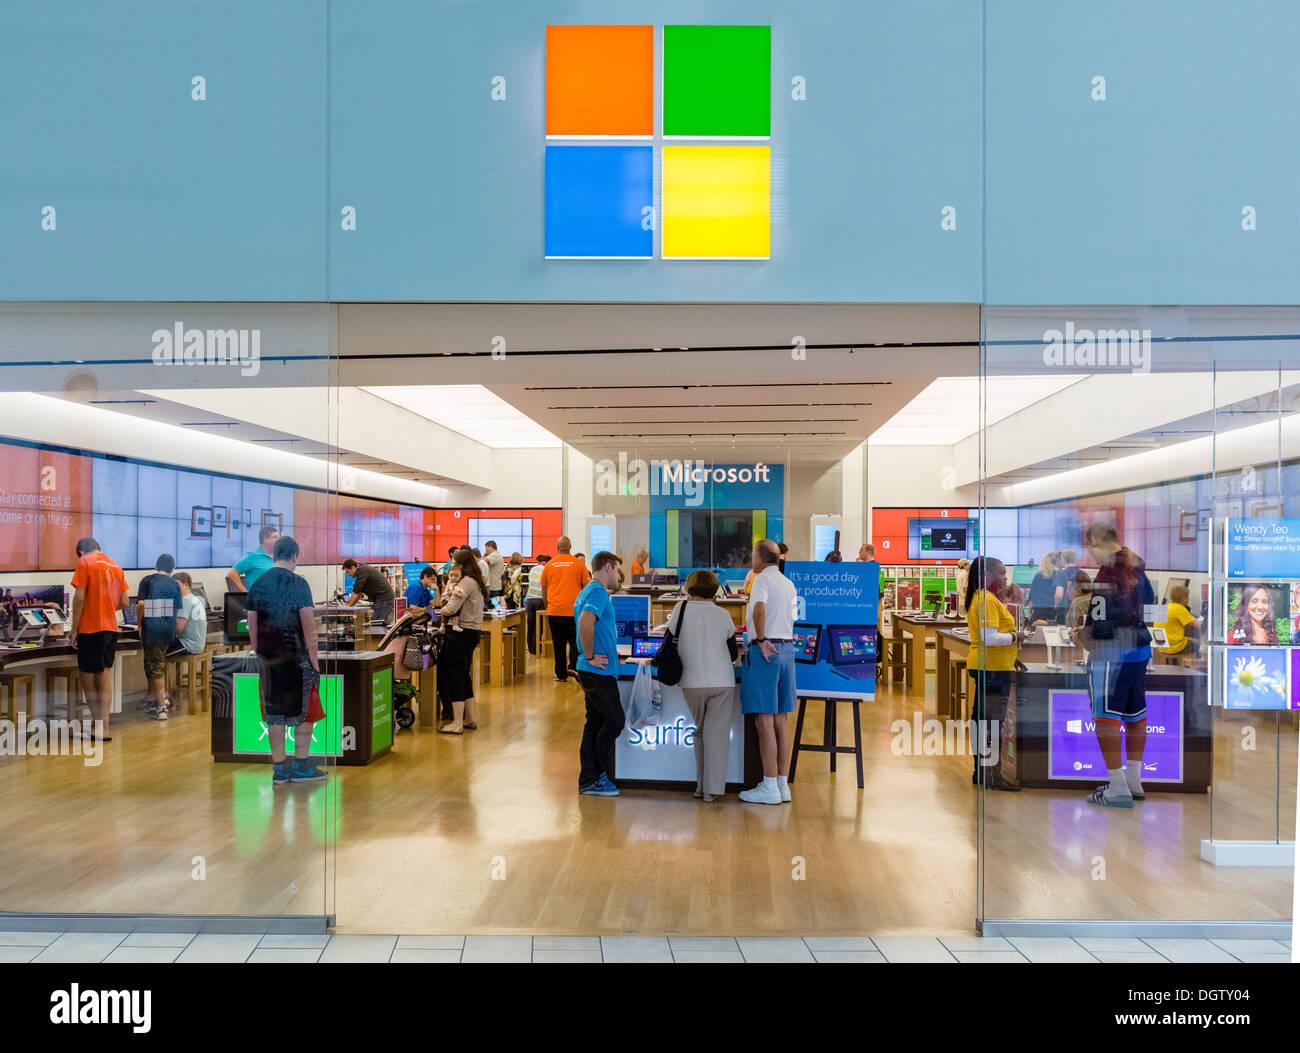 Microsoft store at The Florida Mall, Orlando, Central Florida, USA - Stock Image